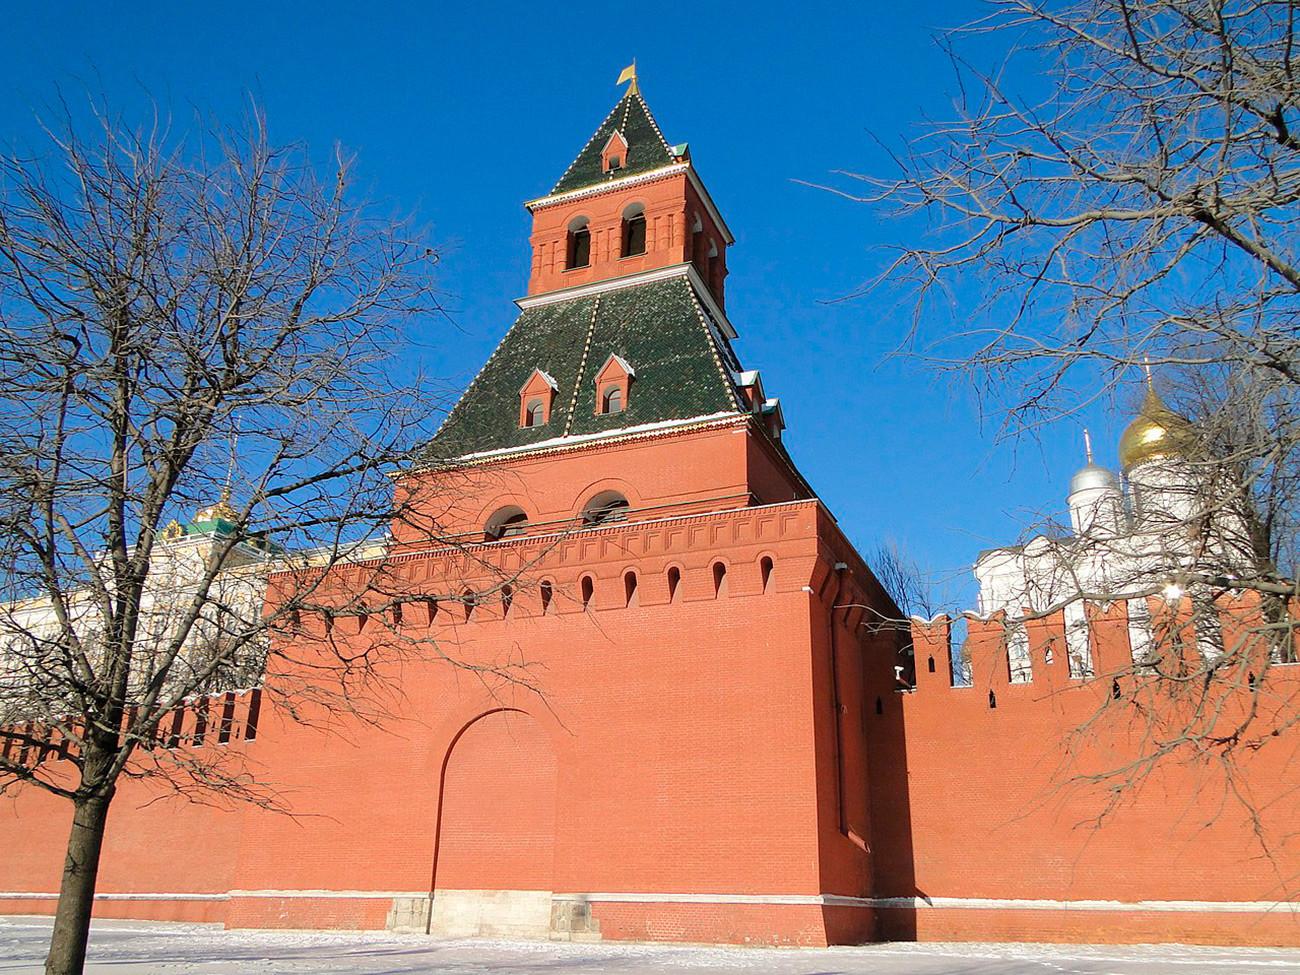 Taynitskaya tower of the Moscow Kremlin